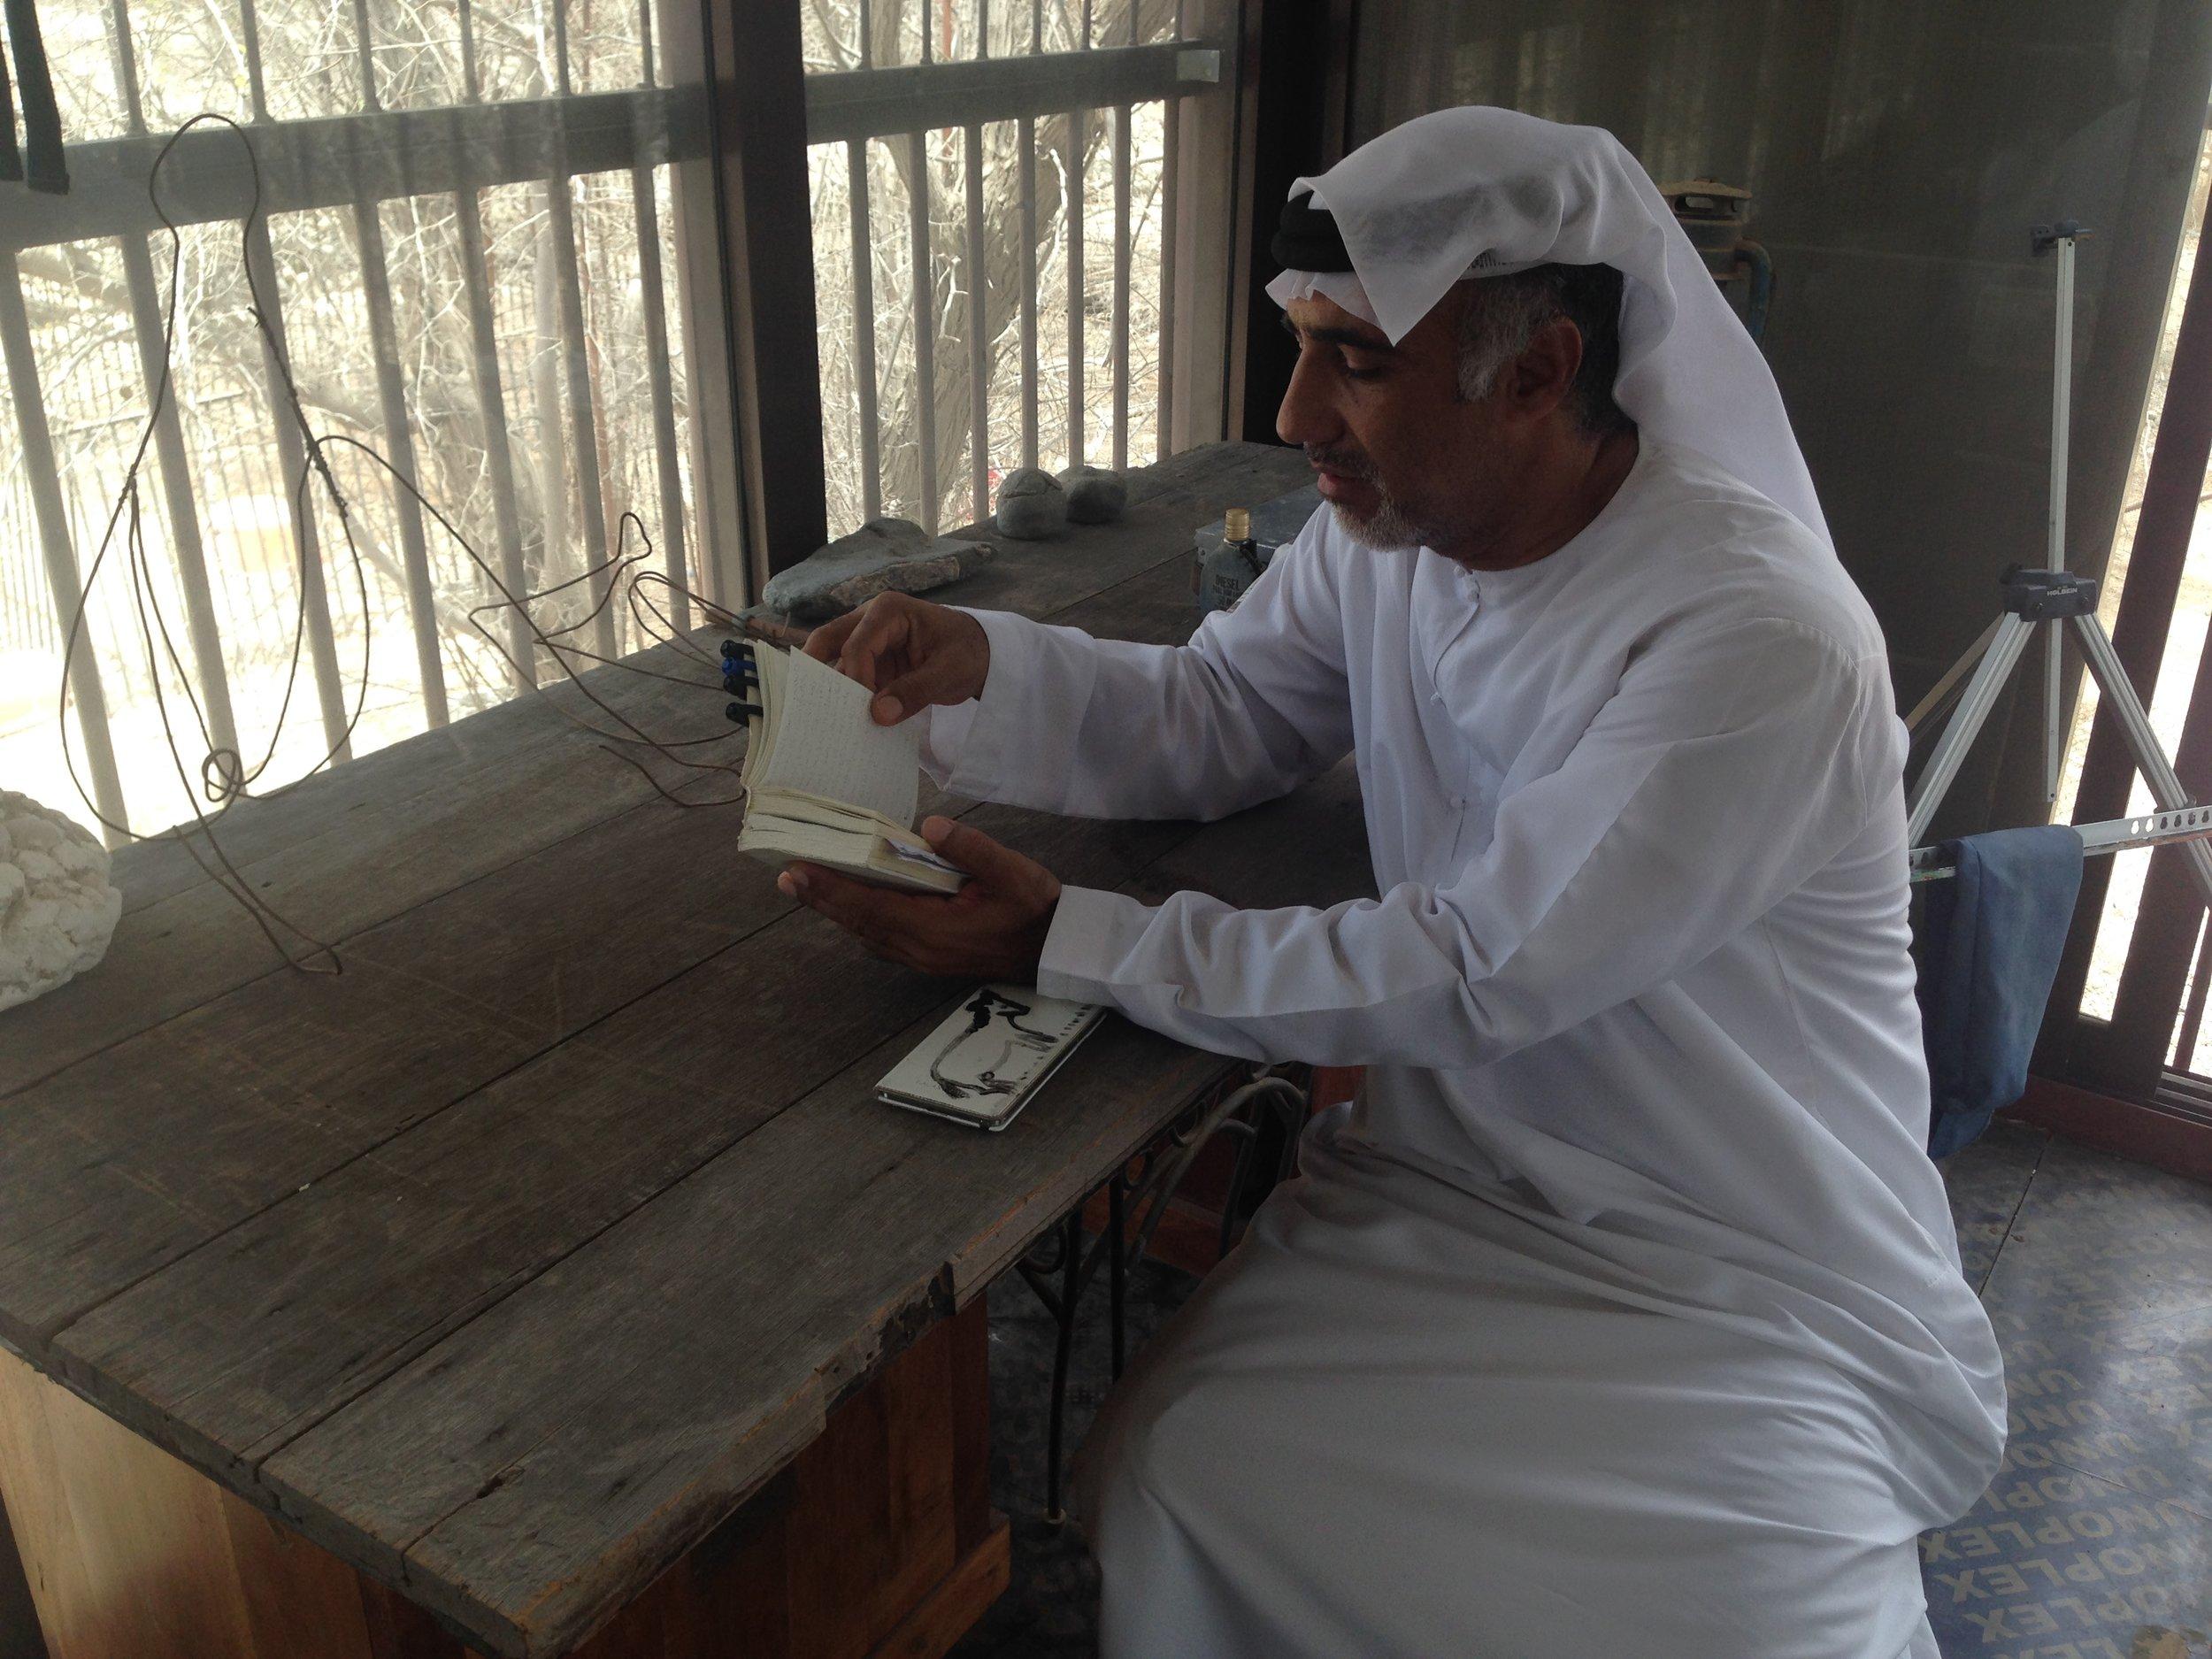 Abdullah Al Saadi sits inside his studio. Image by Anna Seaman